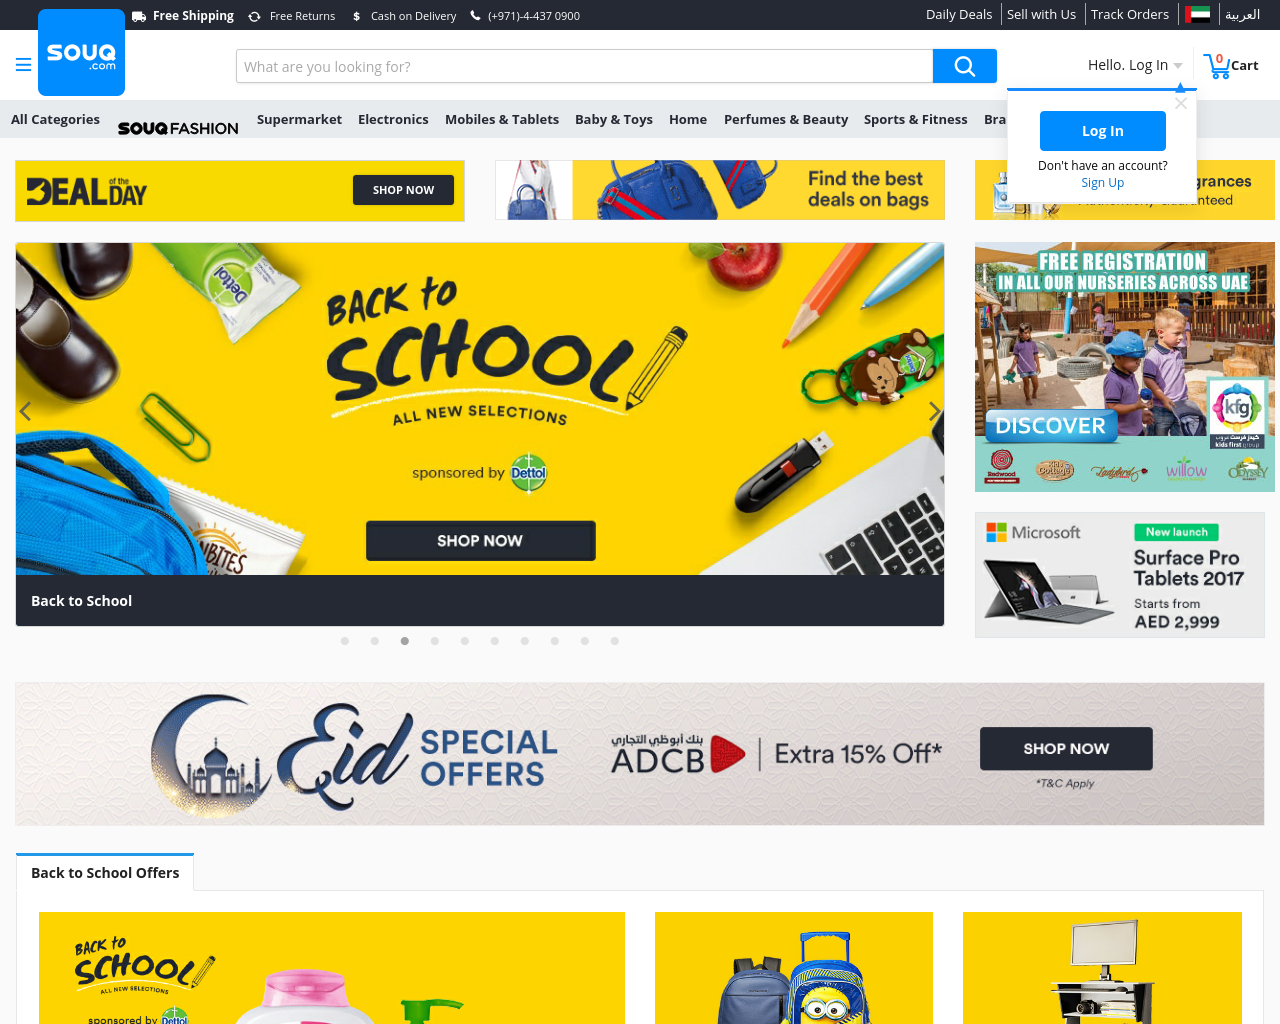 Souq.com-Advertising-Reviews-Pricing